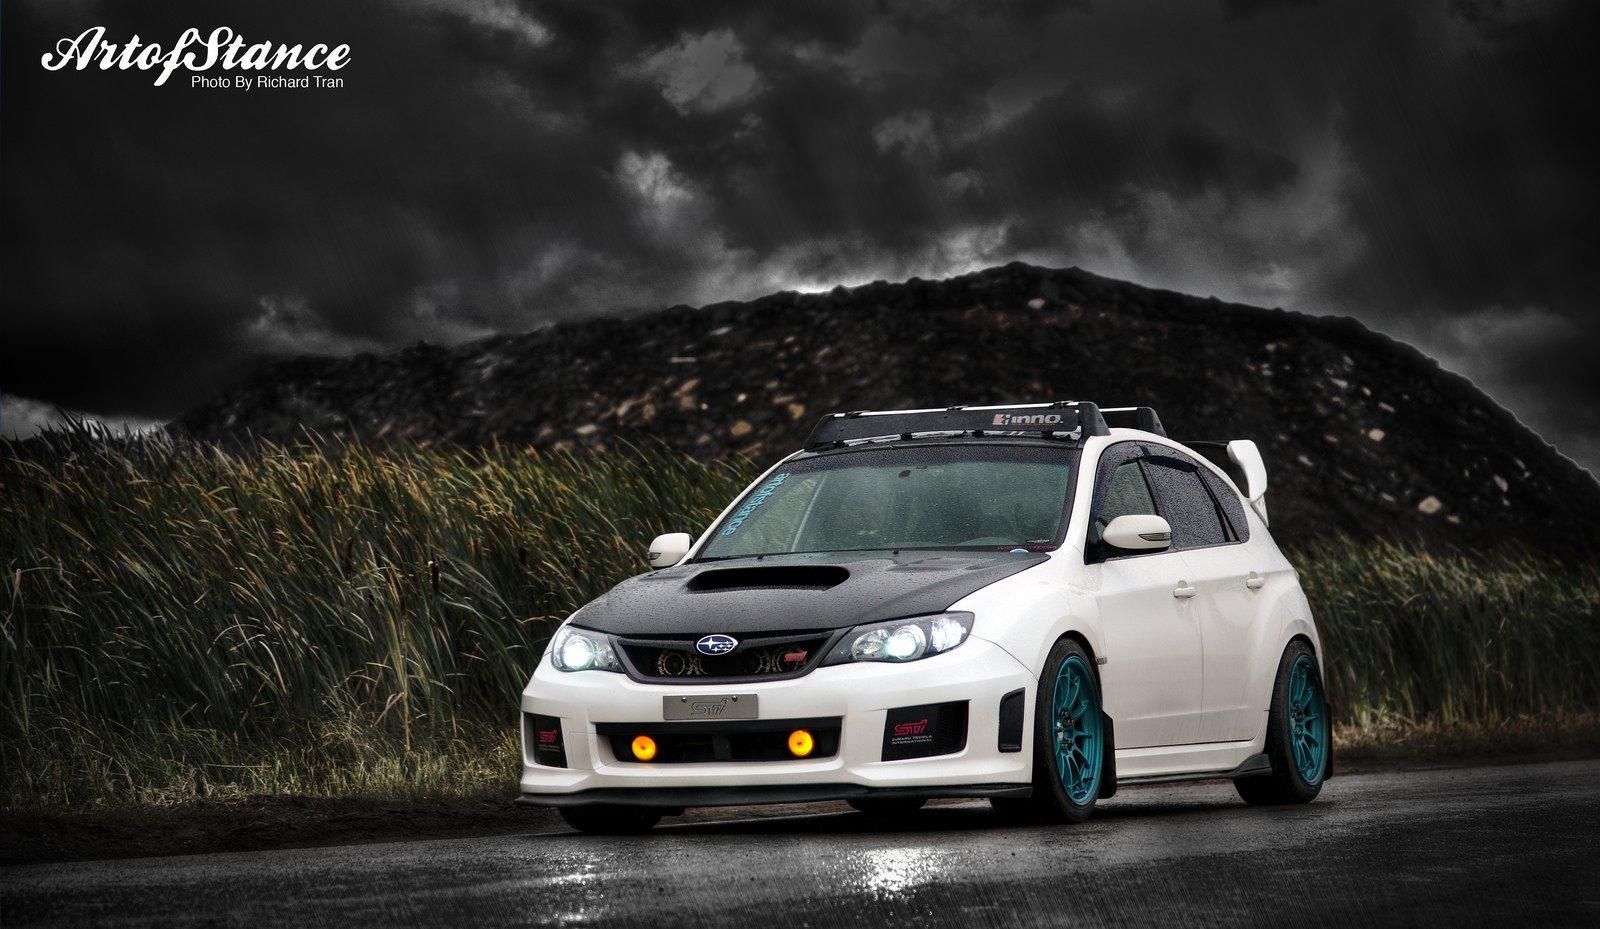 2014 Subaru Wrx Sti Hatchback >> Subaru impreza wrx sportcars rallycars cars hatchback japan sedan tuning wallpaper | 1600x929 ...